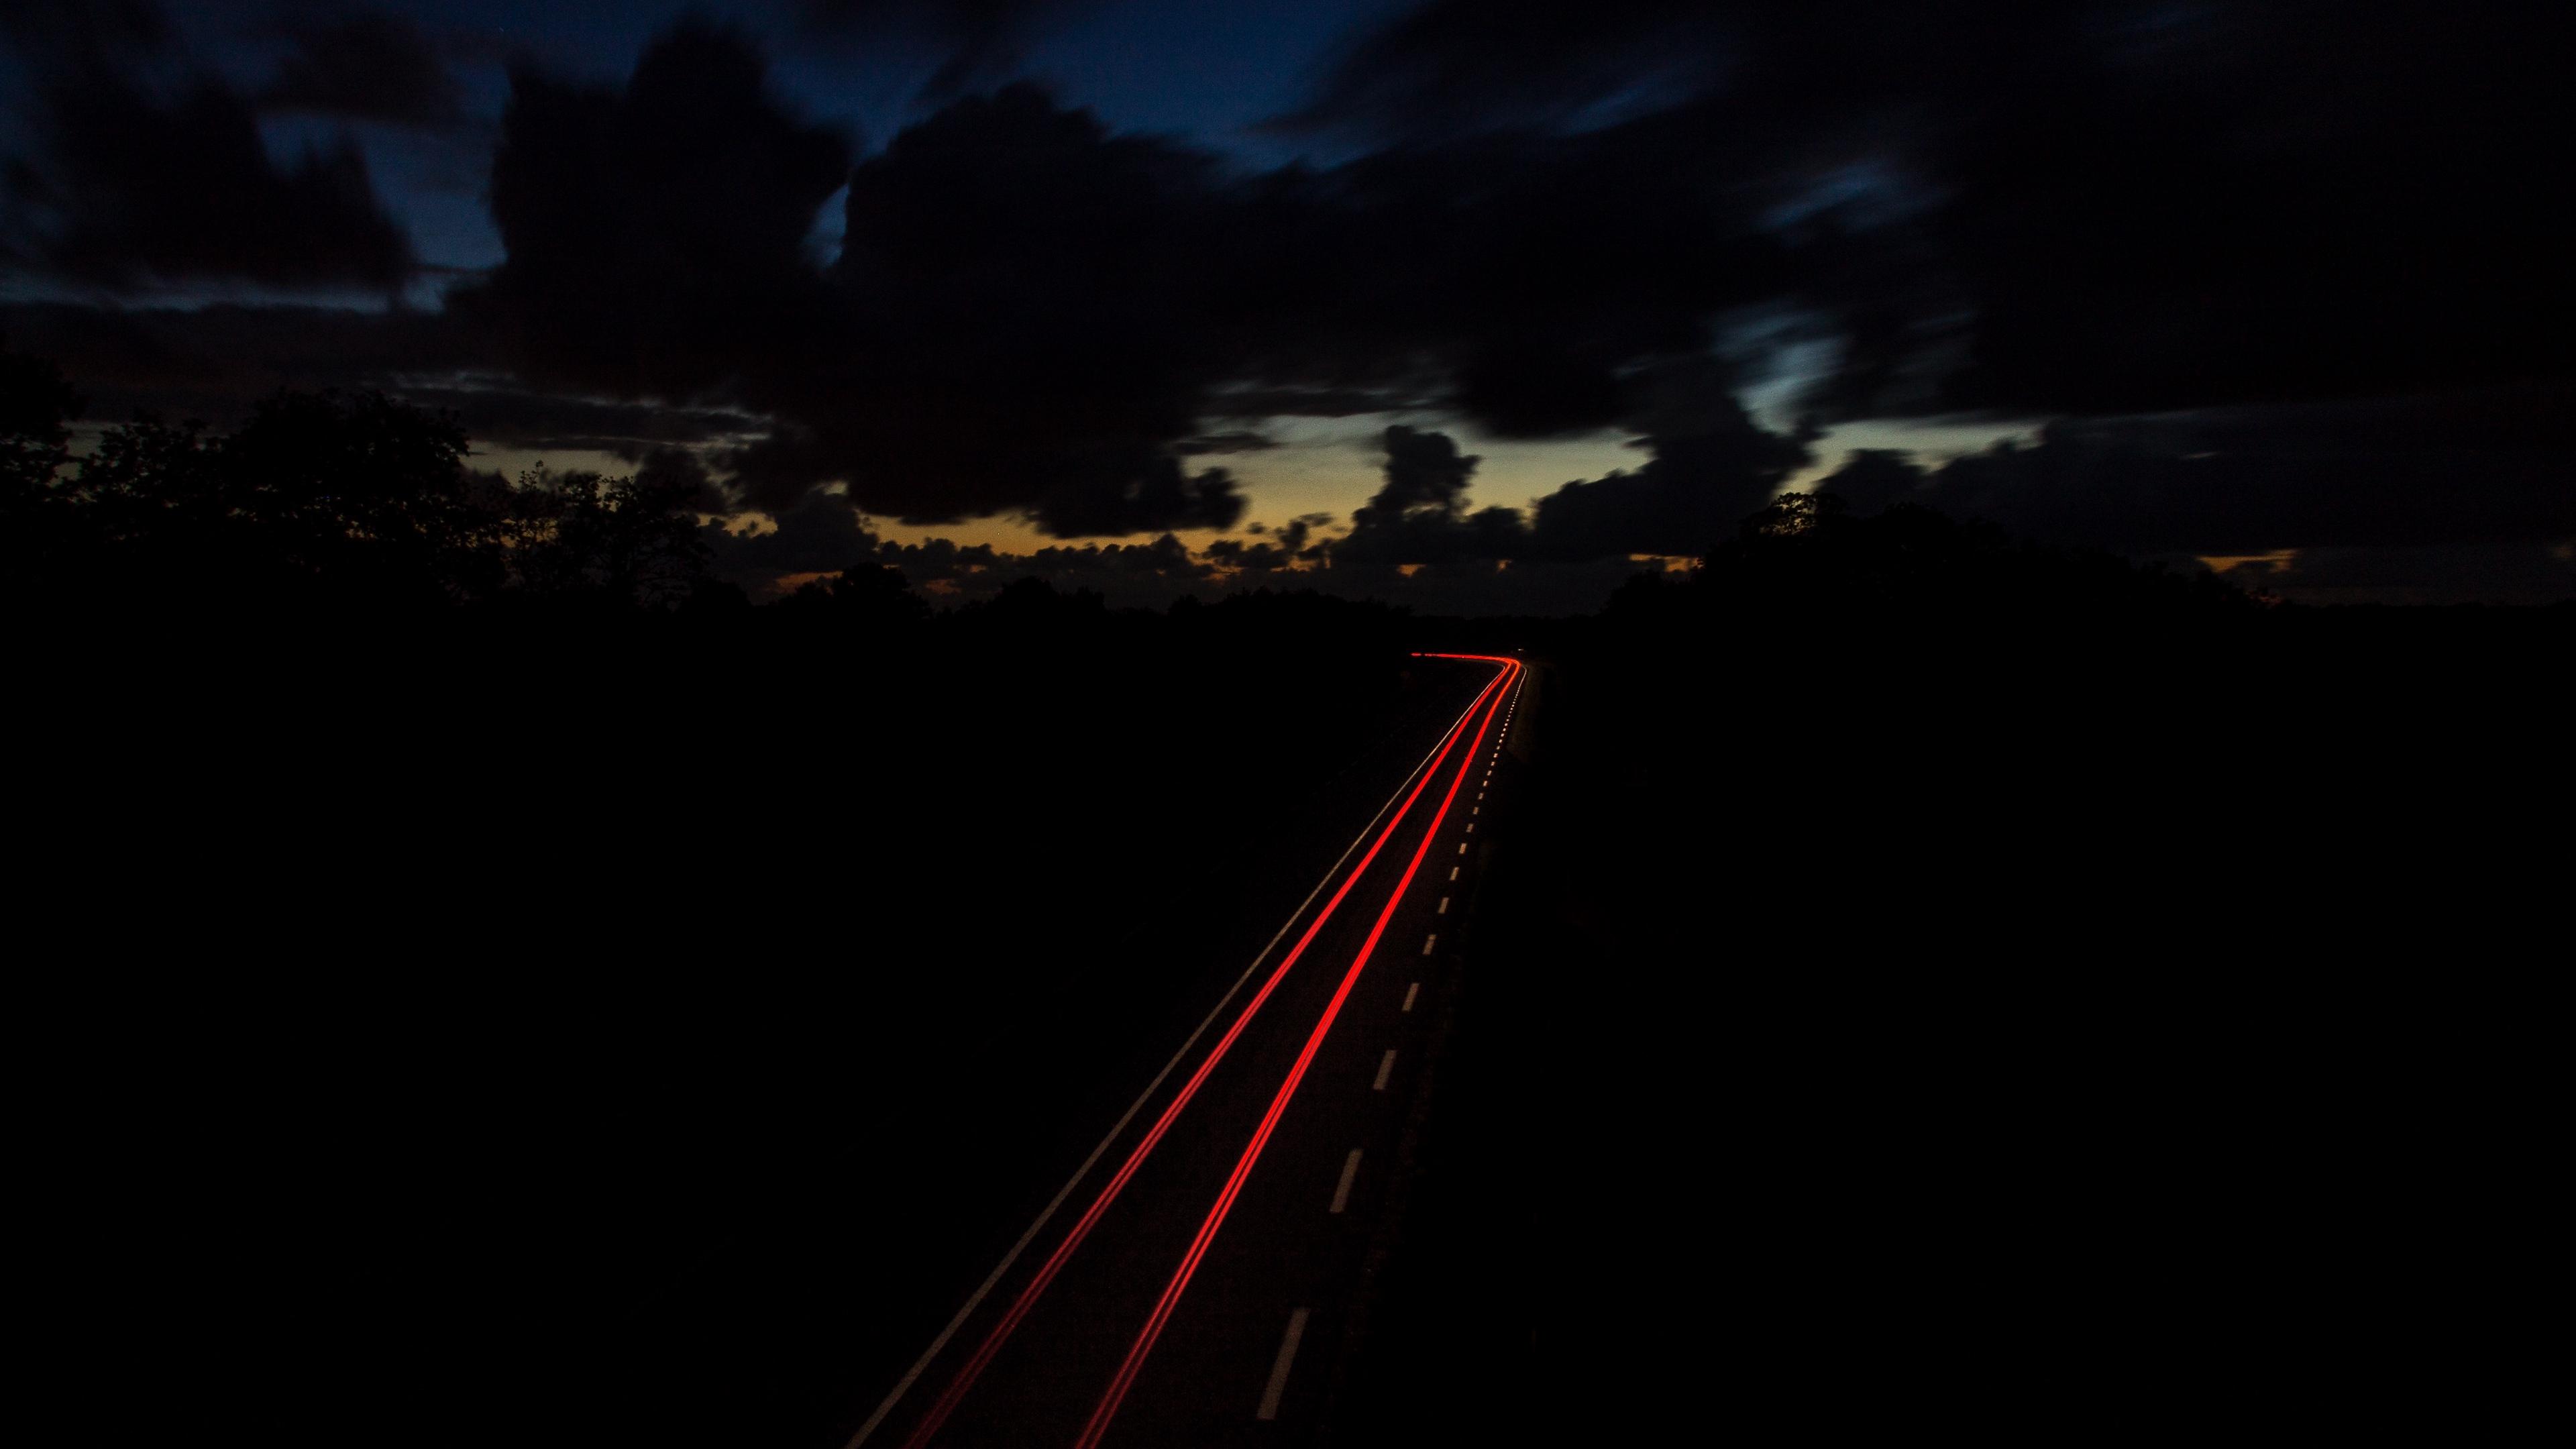 road night turn sky 4k 1540574492 - road, night, turn, sky 4k - turn, Road, Night